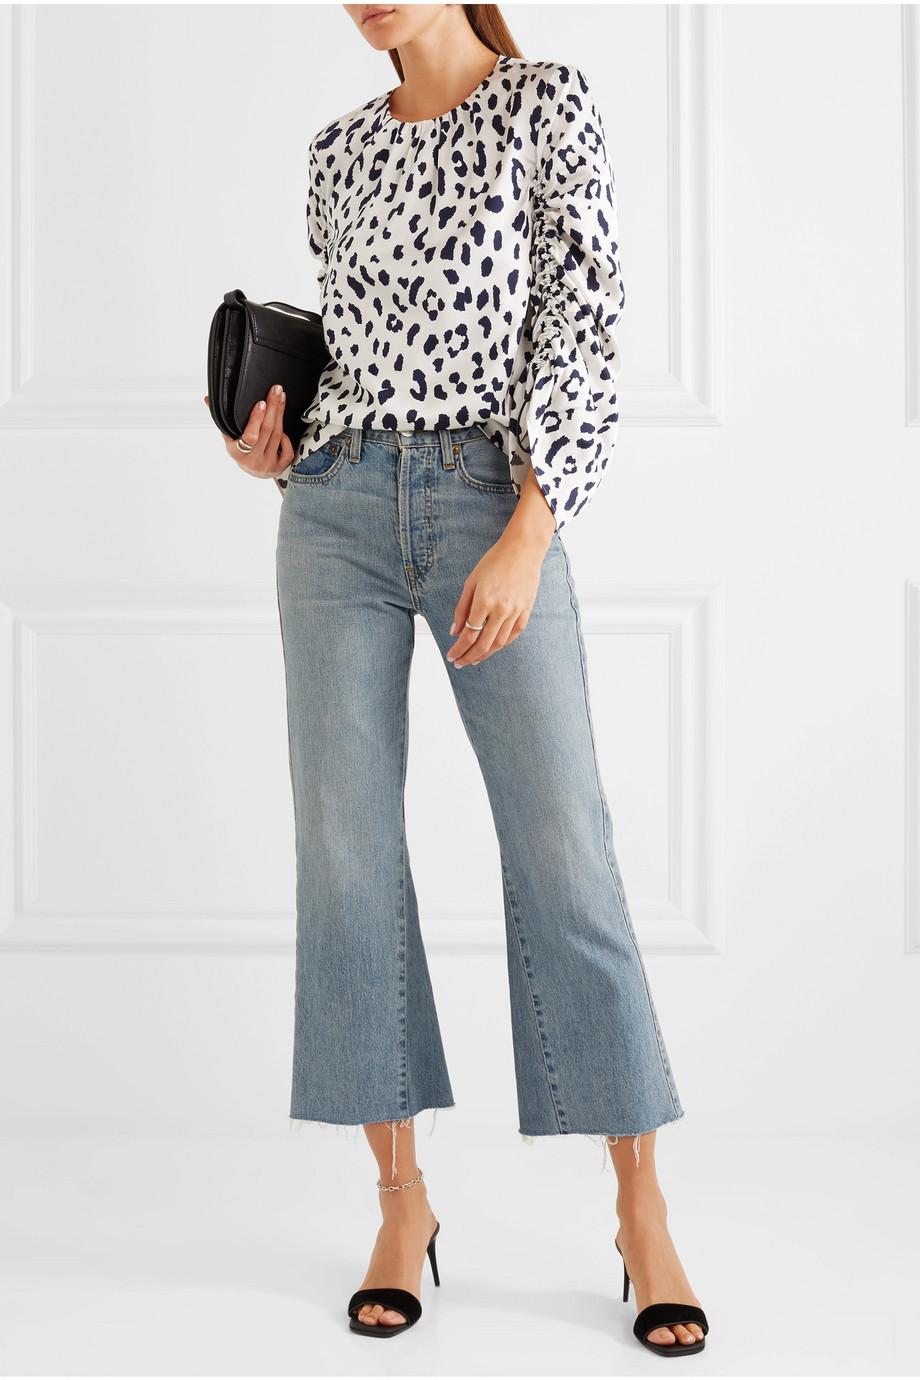 Tibi Leopard-print silk-satin blouse $178.50